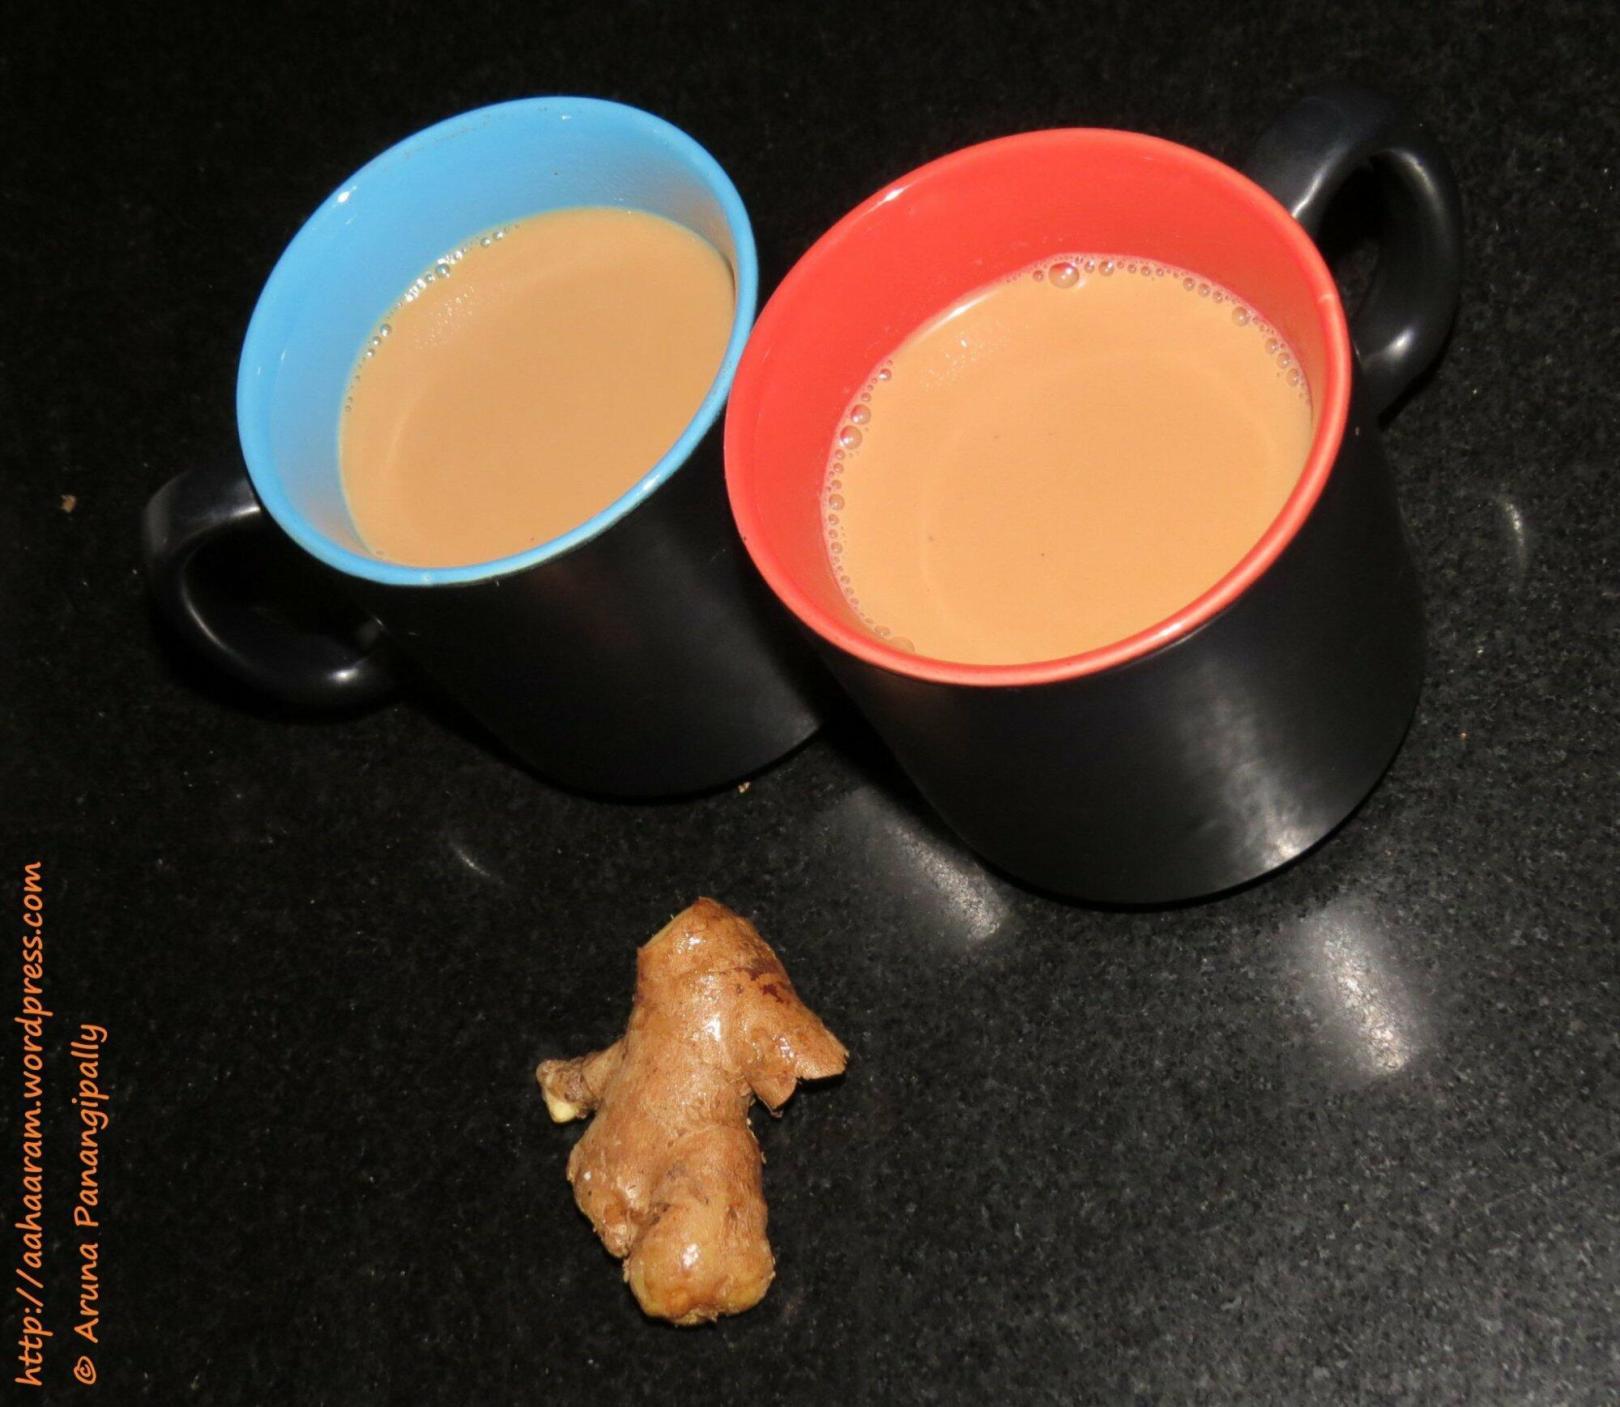 Adrak Wali Chai or Ginger Tea